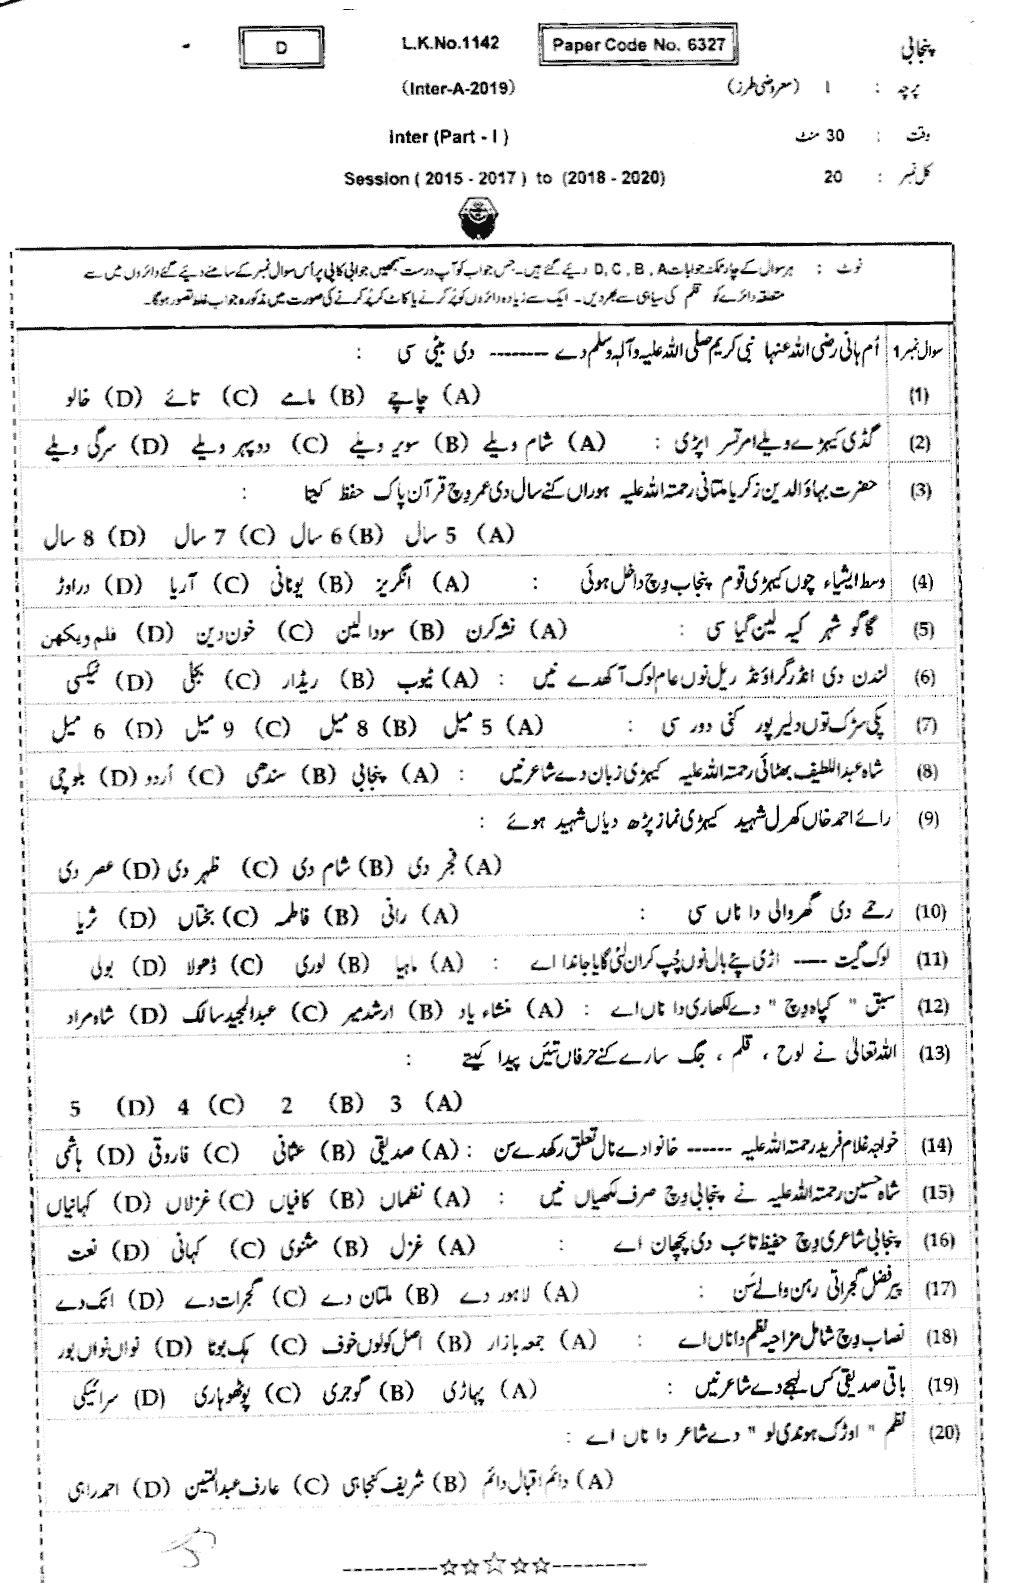 11th Class Punjabi Group 1 Objective Bahawalpur Board